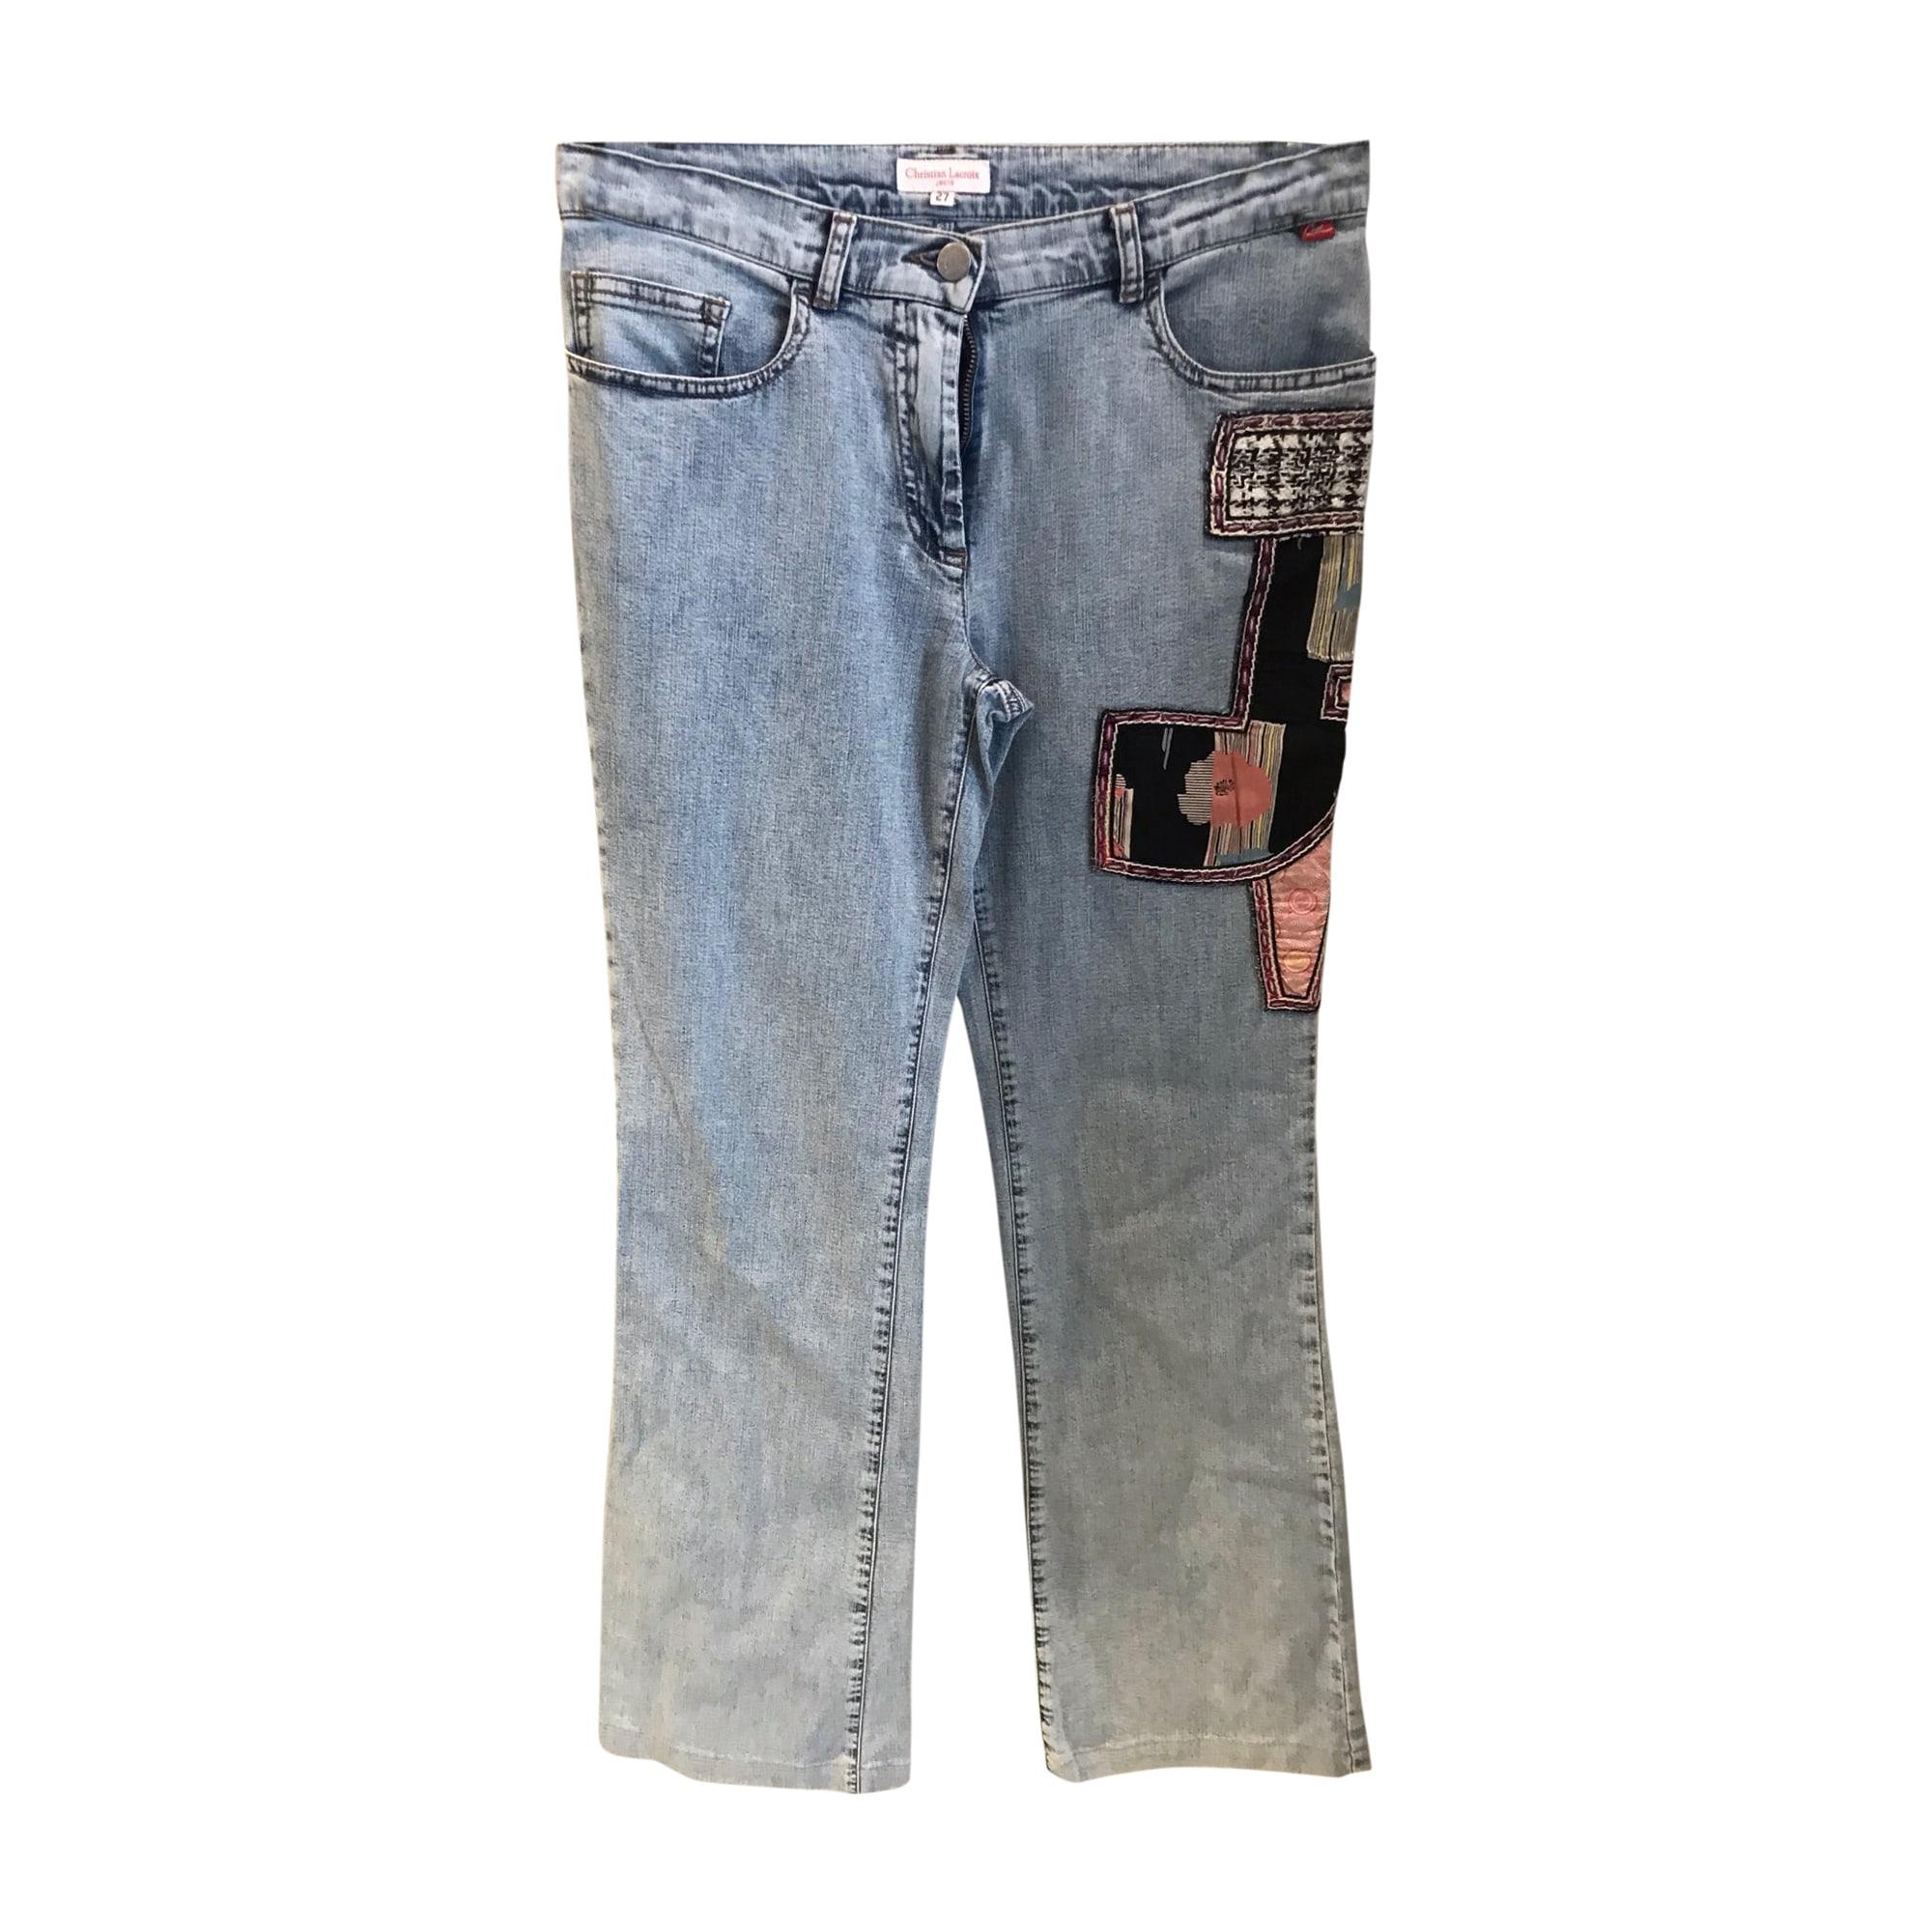 Tailleur pantalon CHRISTIAN LACROIX Bleu, bleu marine, bleu turquoise